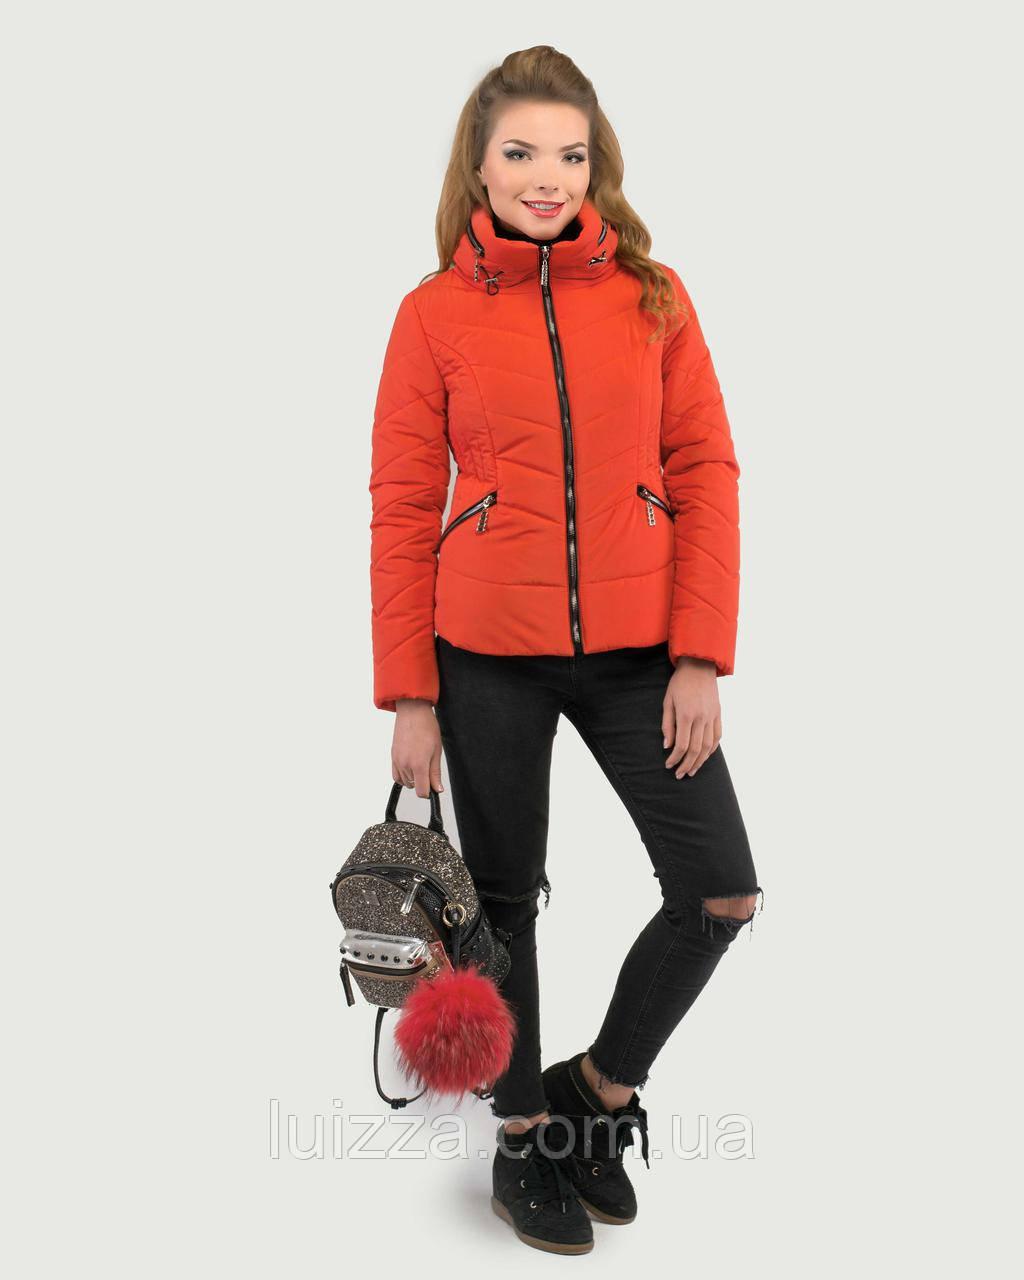 Молодежная короткая куртка 50-52рр коралл 48